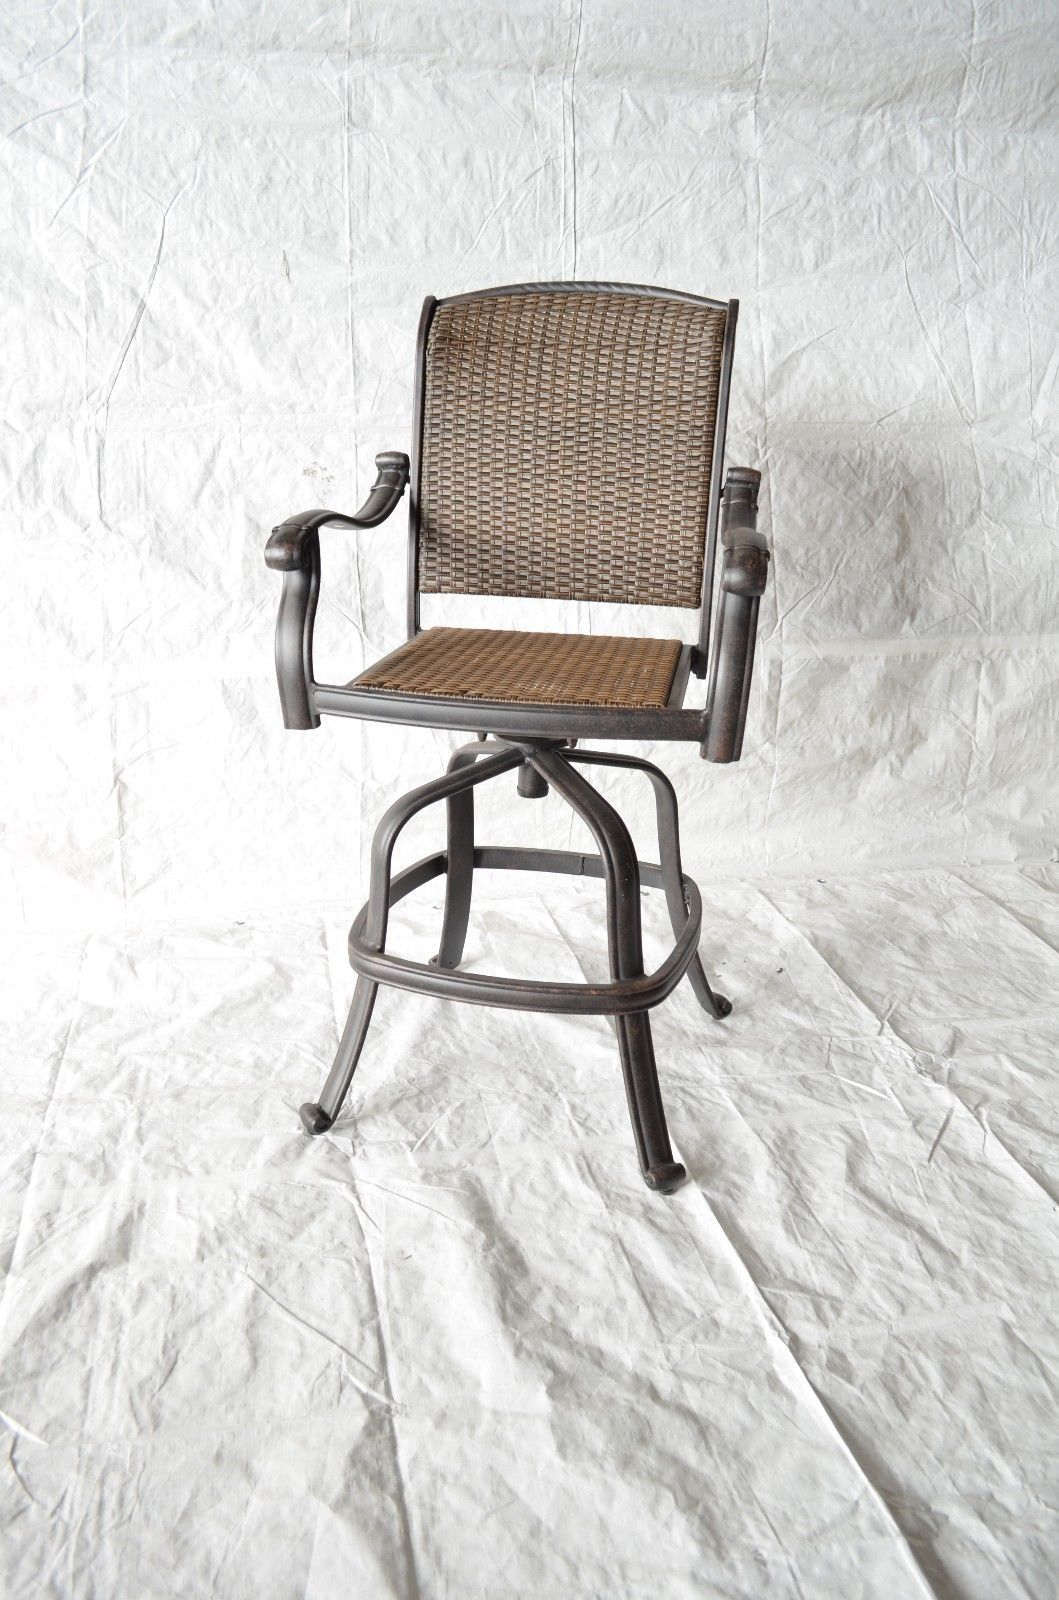 outdoor bar chairs chair to bed santa clara patio swivel stools cast aluminum